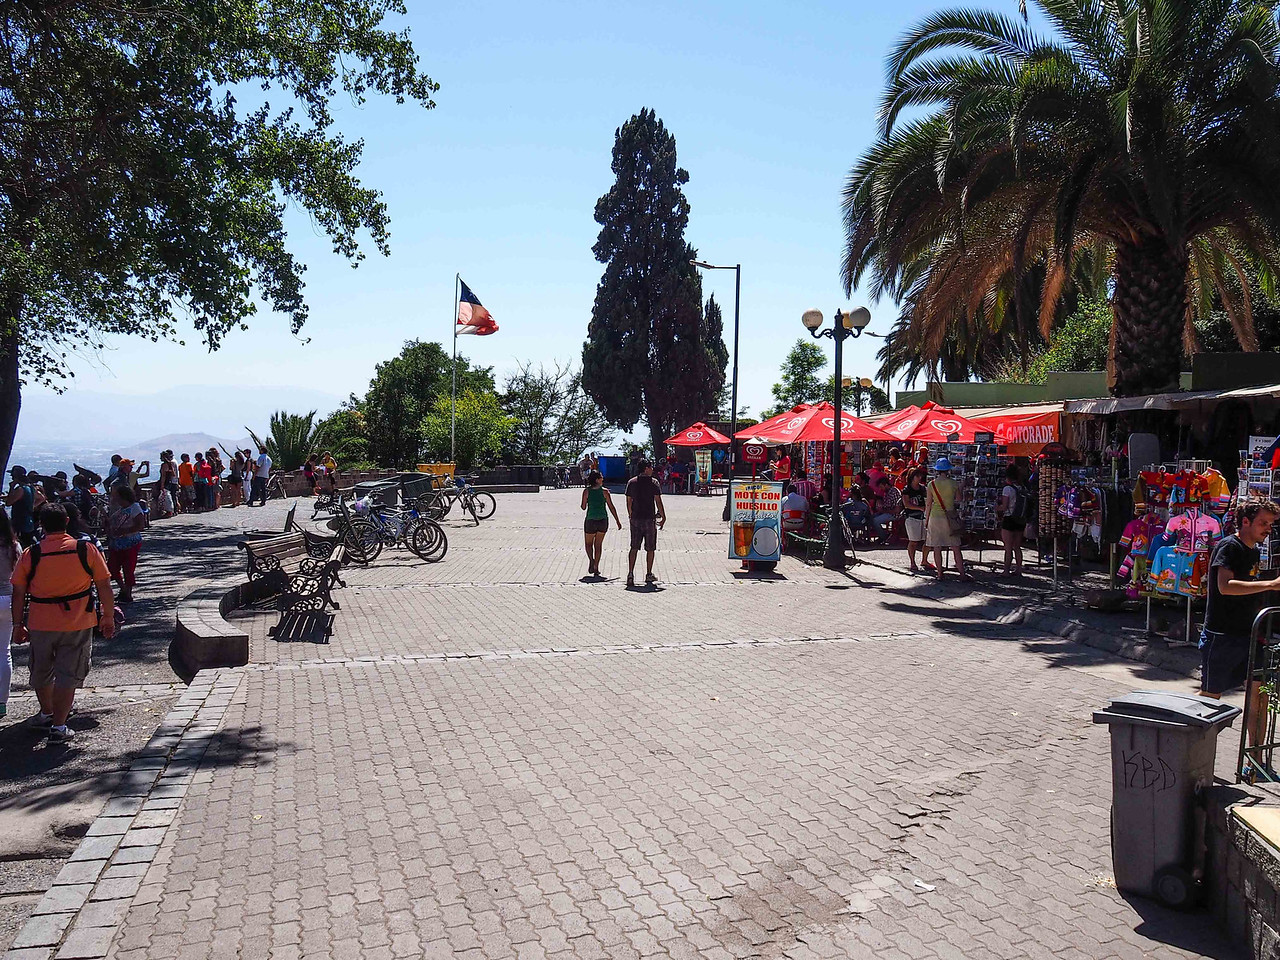 Plaza and vendors atop San Cristobal Hill